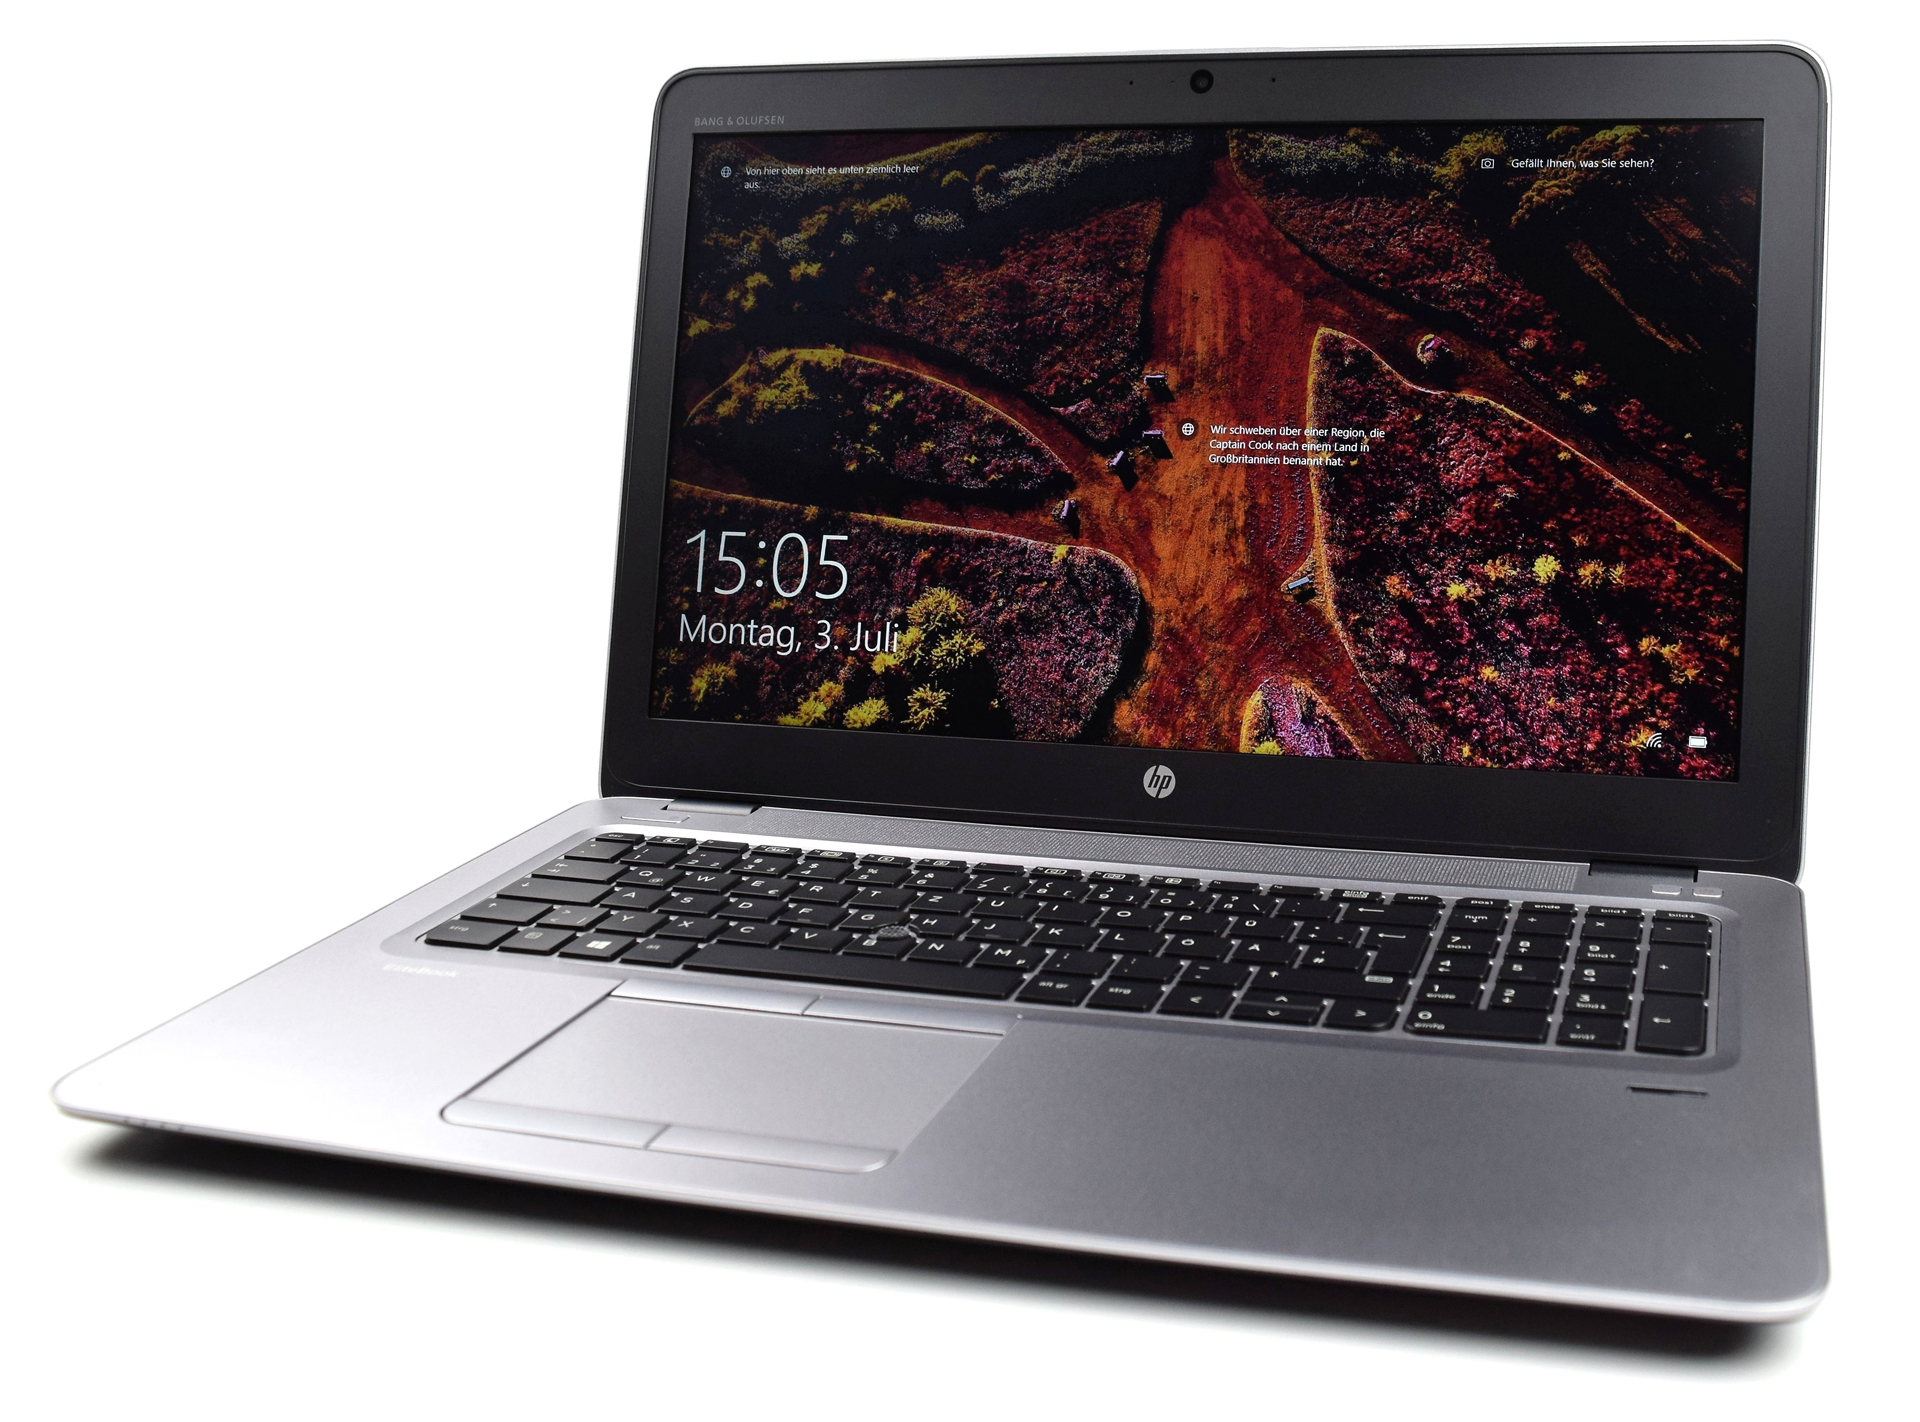 HP EliteBook 755 G2 Huawei Modem Download Driver